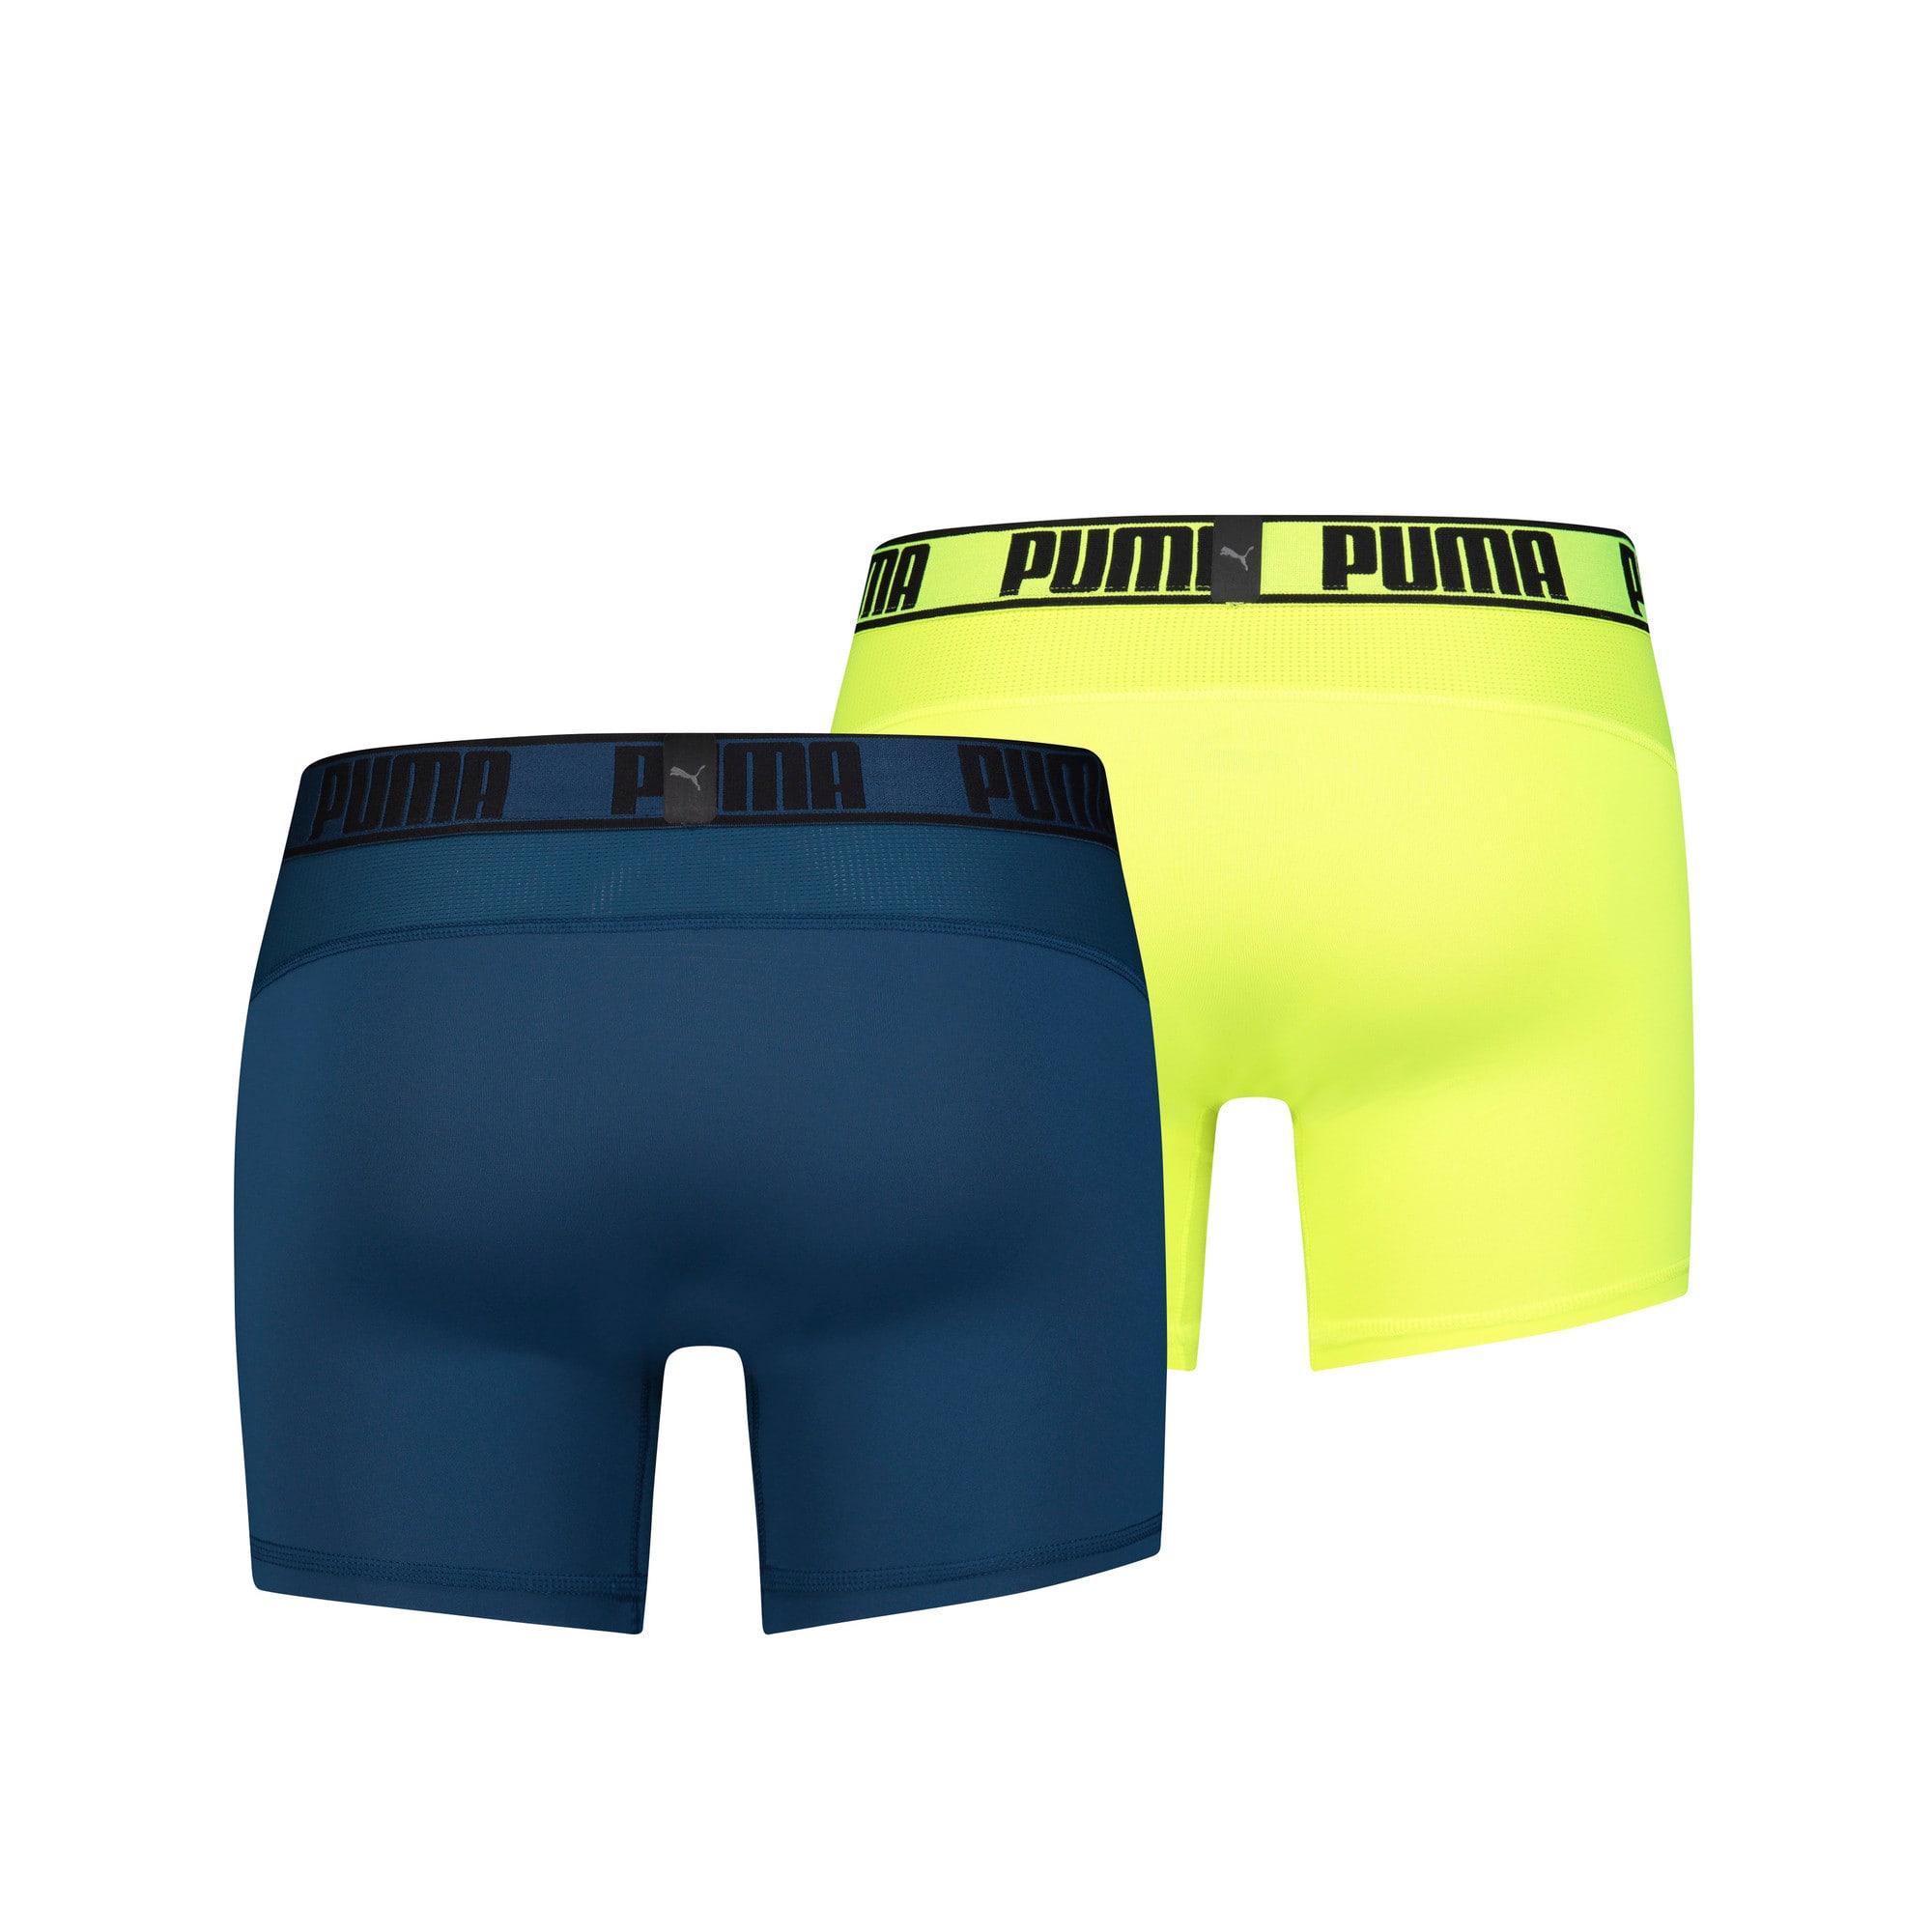 Thumbnail 2 of Active Men's Boxer Shorts 2 Pack, sea green / yellow, medium